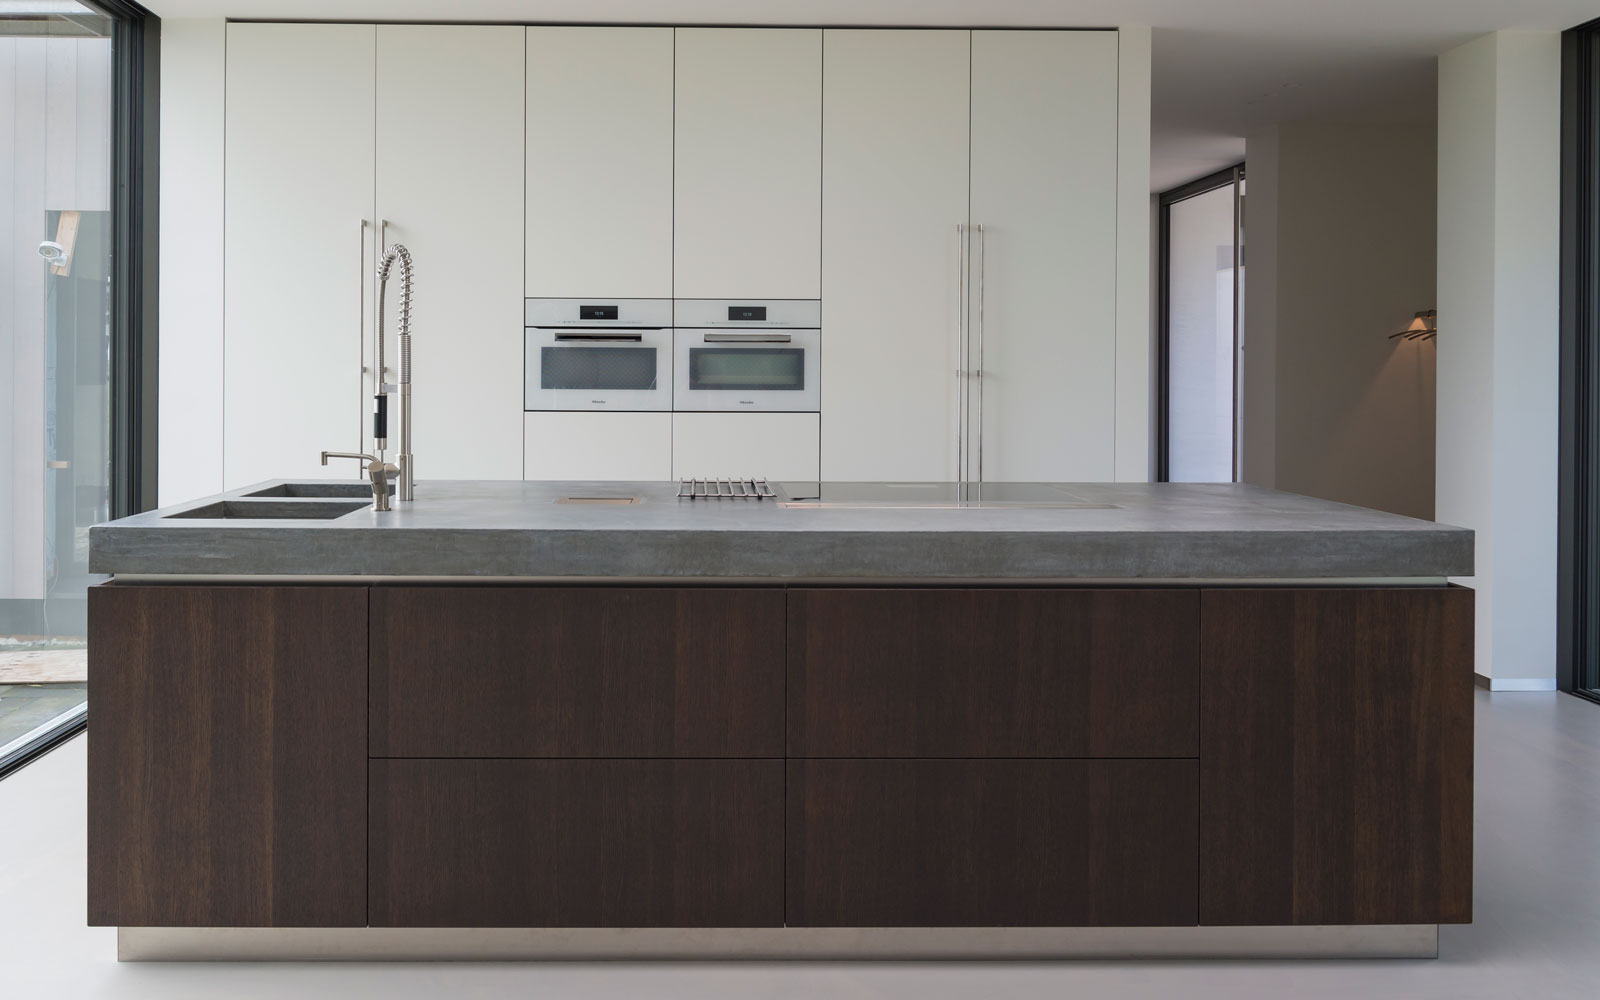 Keuken, modern, gietvloer, kookeiland, grote ramen, moderne uitbouw, Lautenbag Architectuur